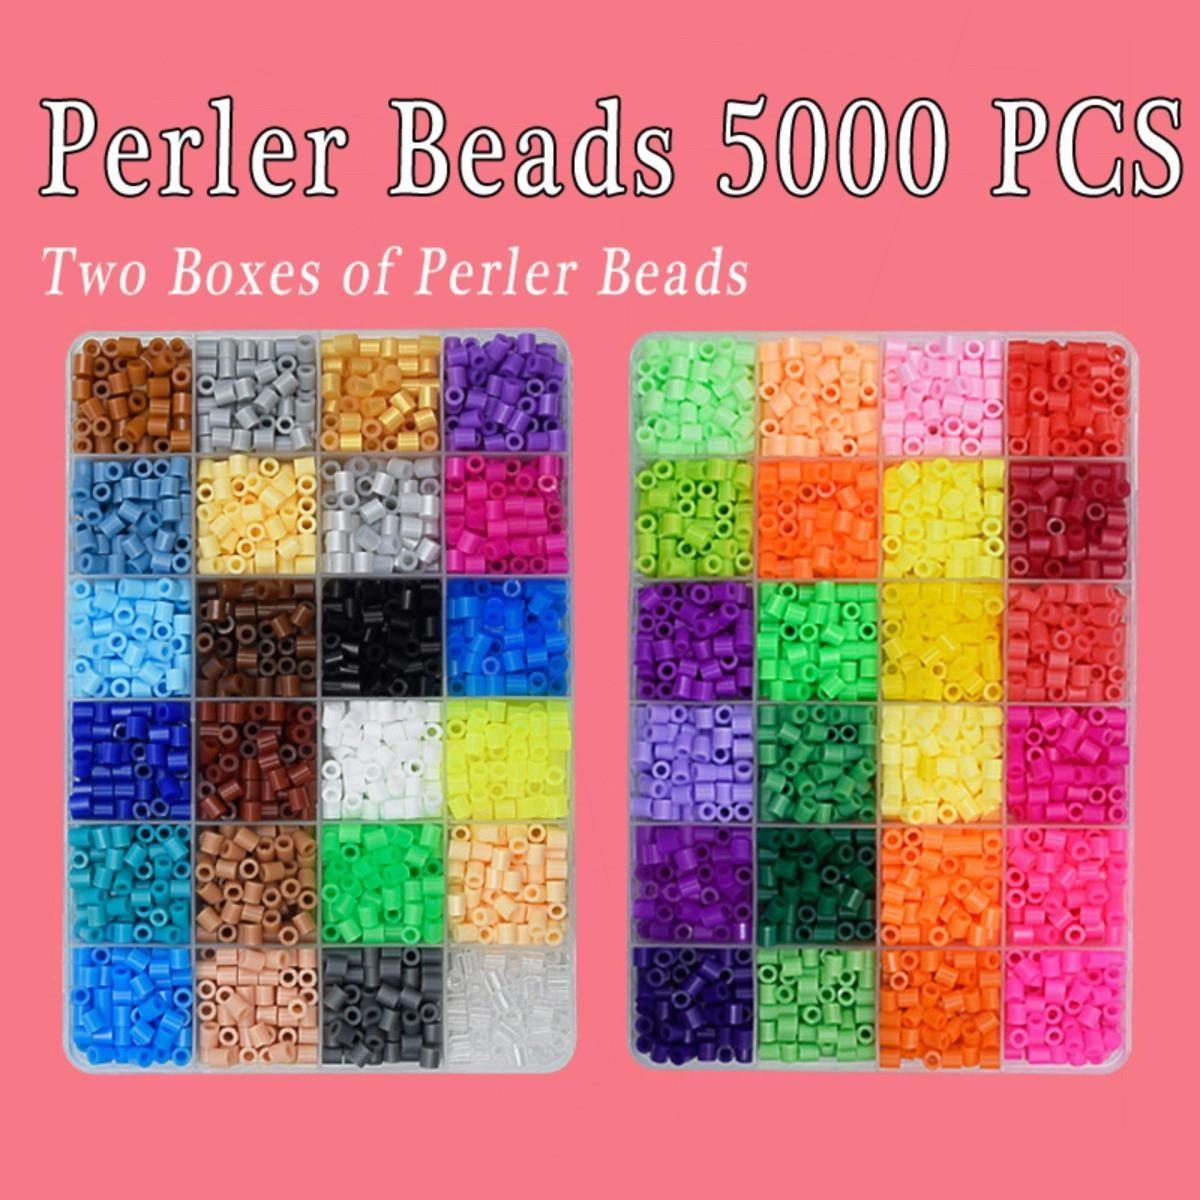 Perler Beads Fused Bead Kit 5000 Piece Beads Craft Beads For Kids By Tcgbhvkog.